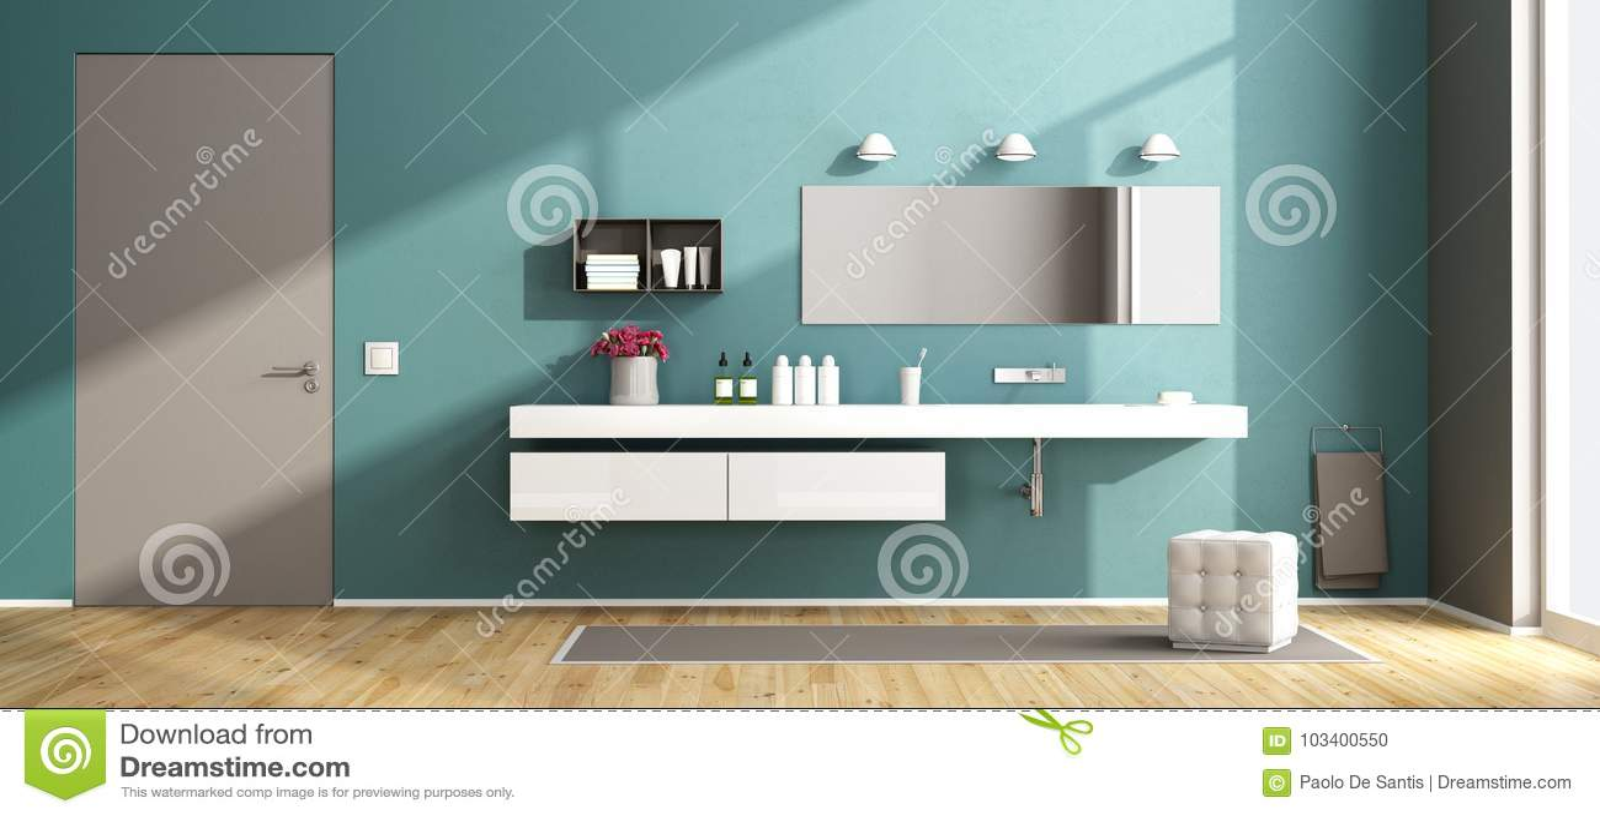 Blue modern bathroom stock illustration. Illustration of home ...